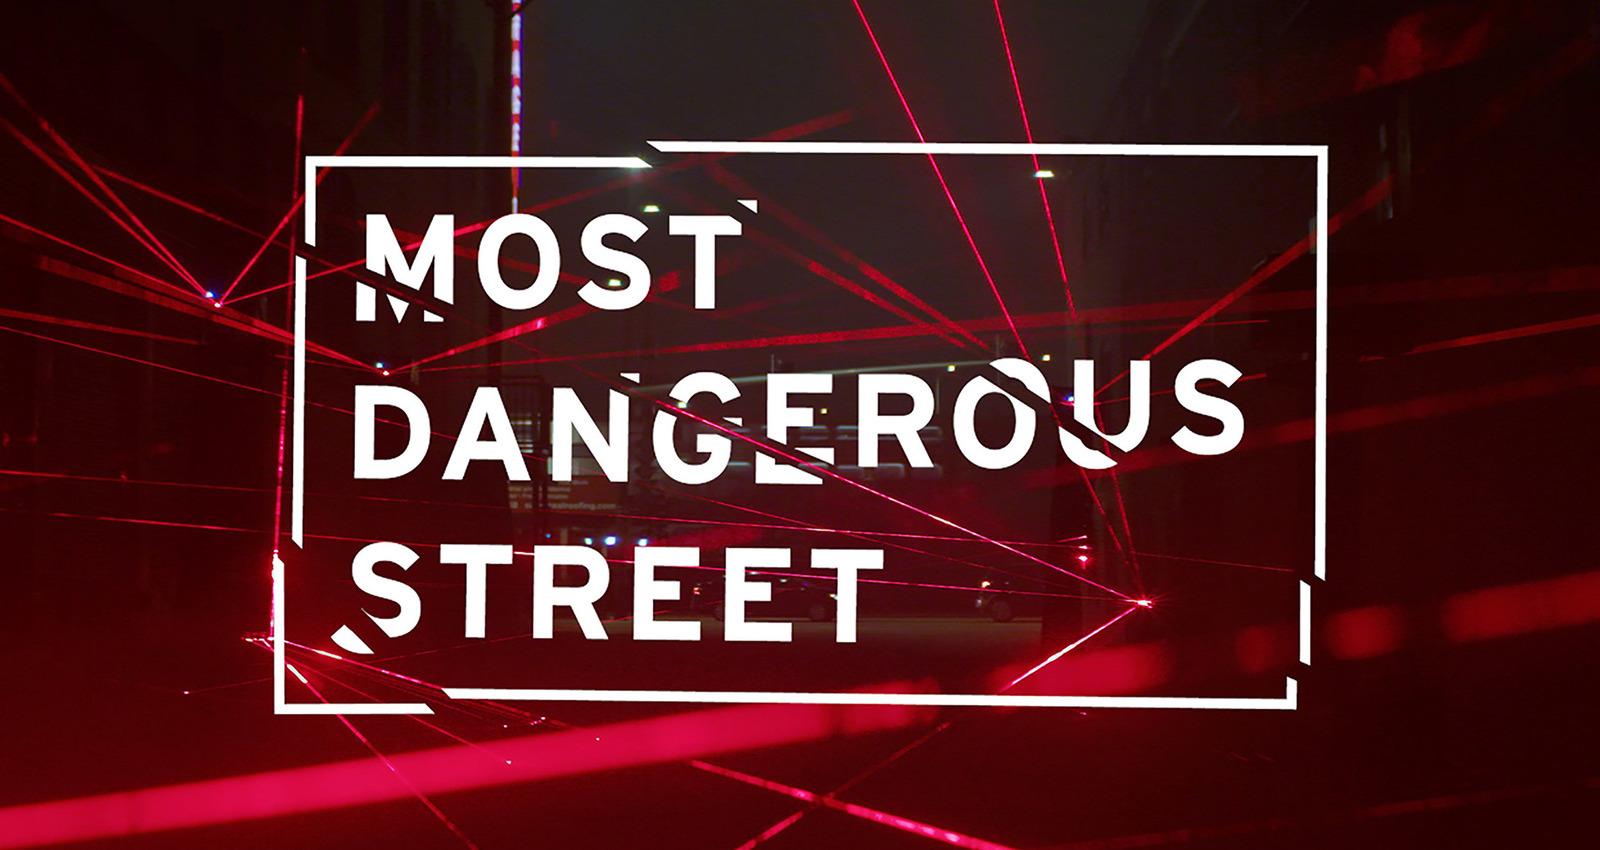 Most Dangerous Street